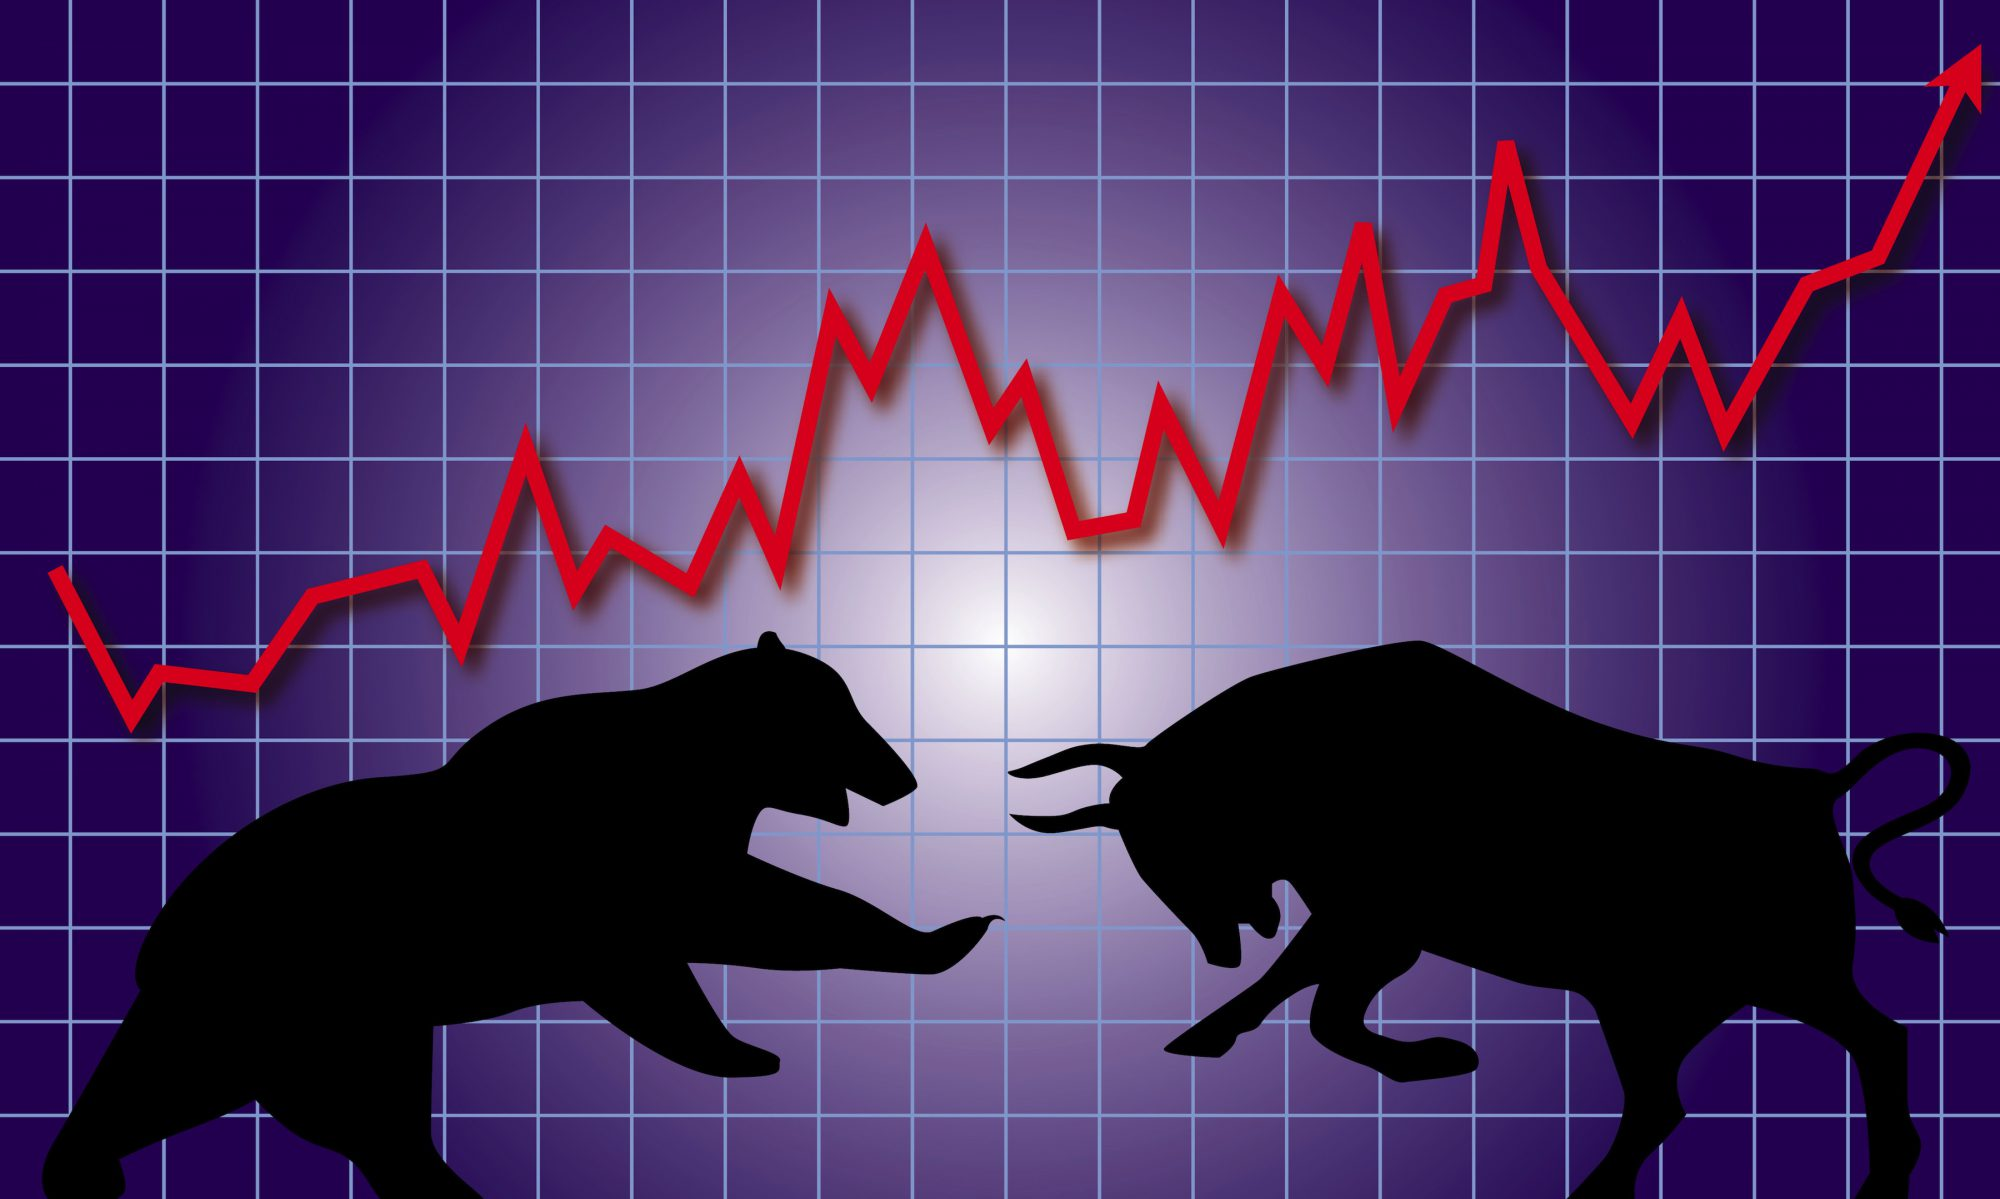 Stock Market Research, Option Picks, Stock Picks,Financial News,Option Research